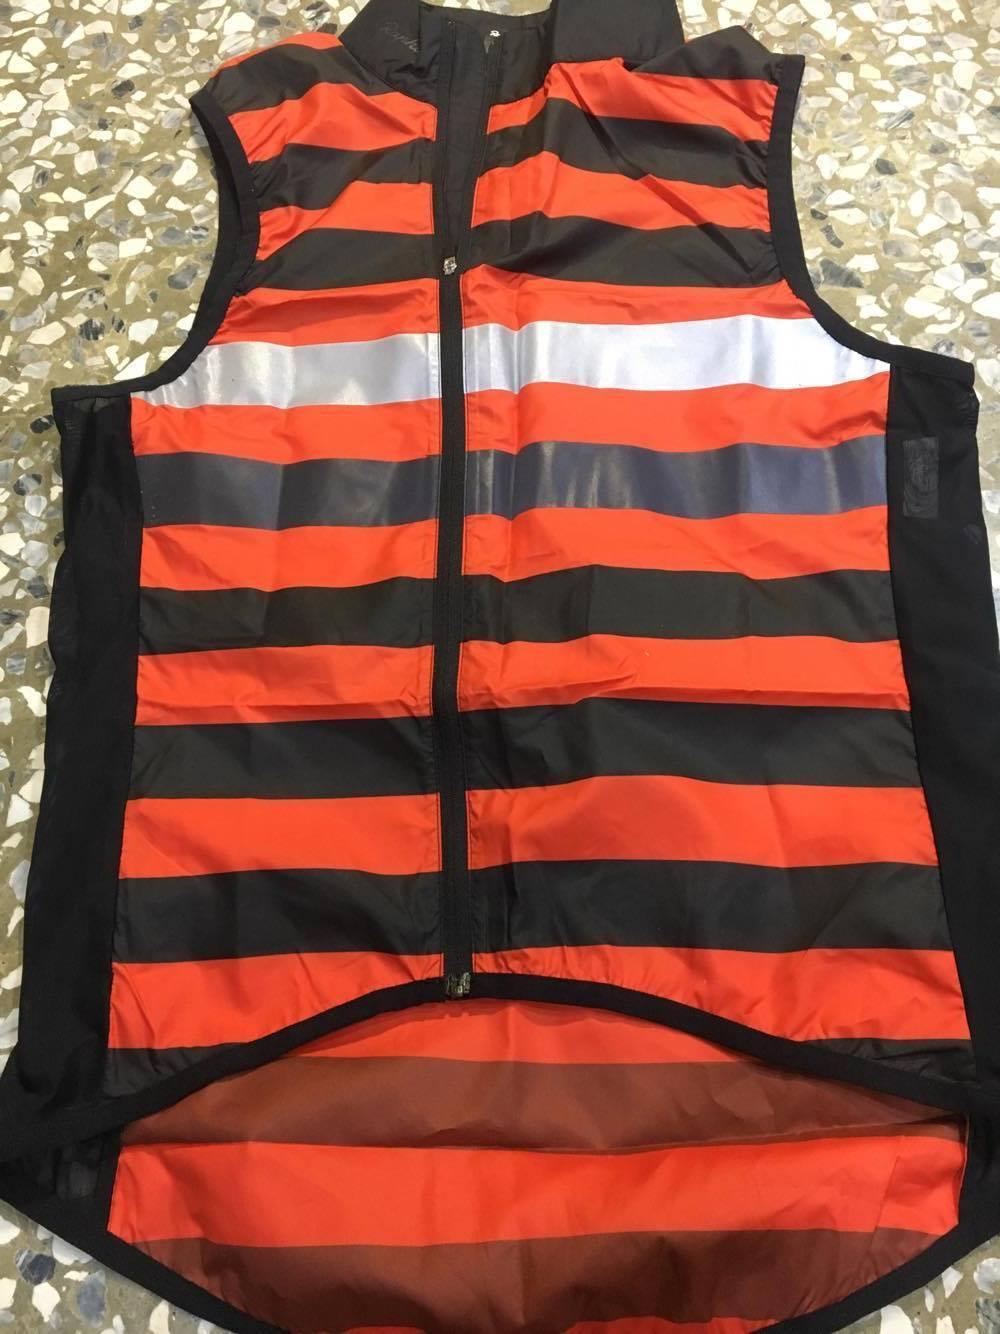 Rapha Brevet Gilet Cycling Vest .  available size  S